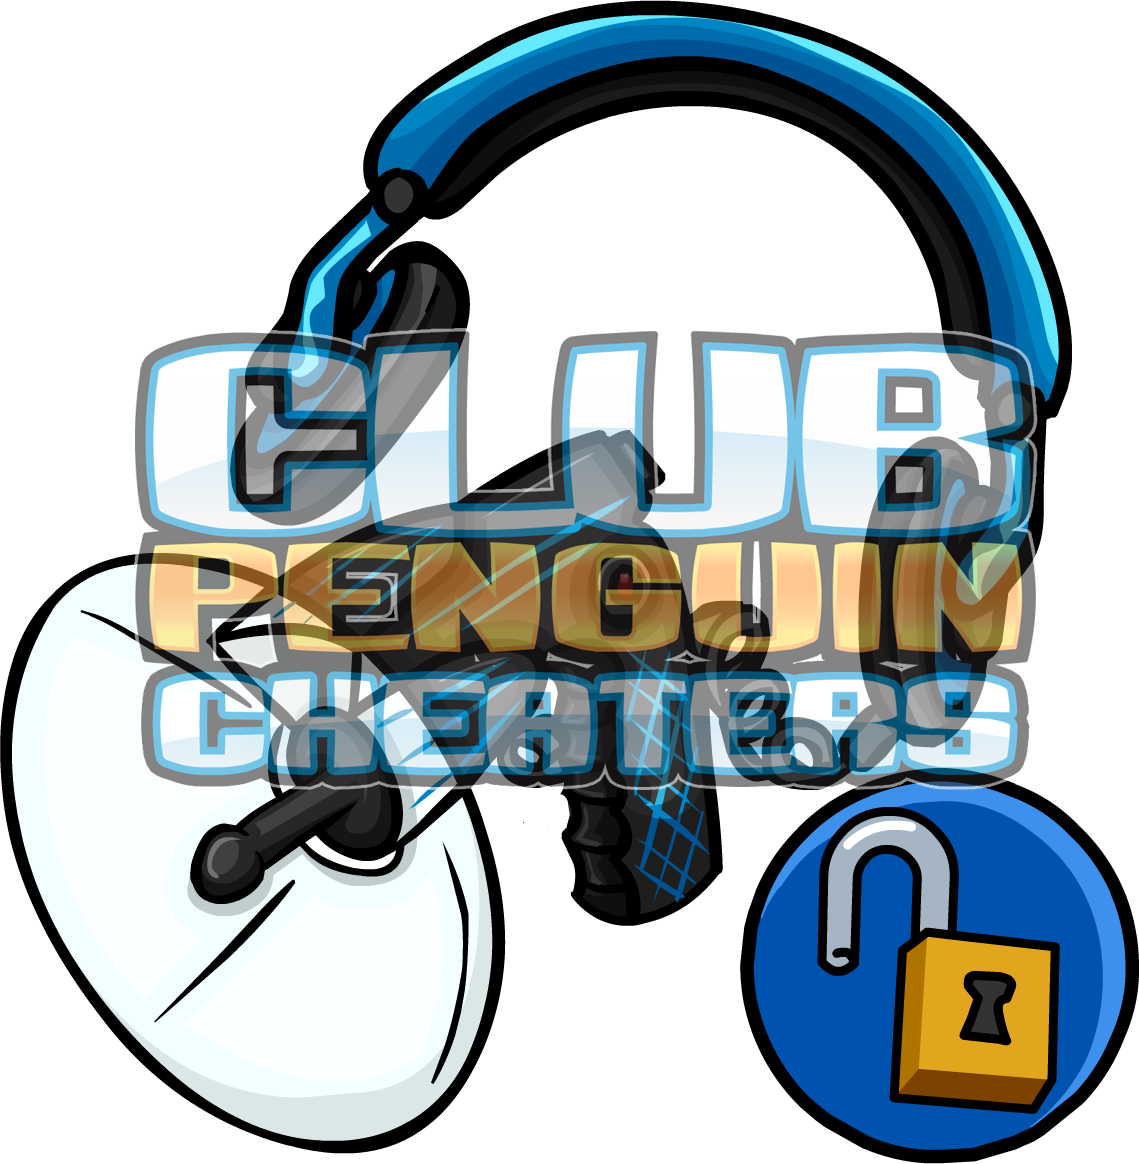 Club Penguin Island Copypasta